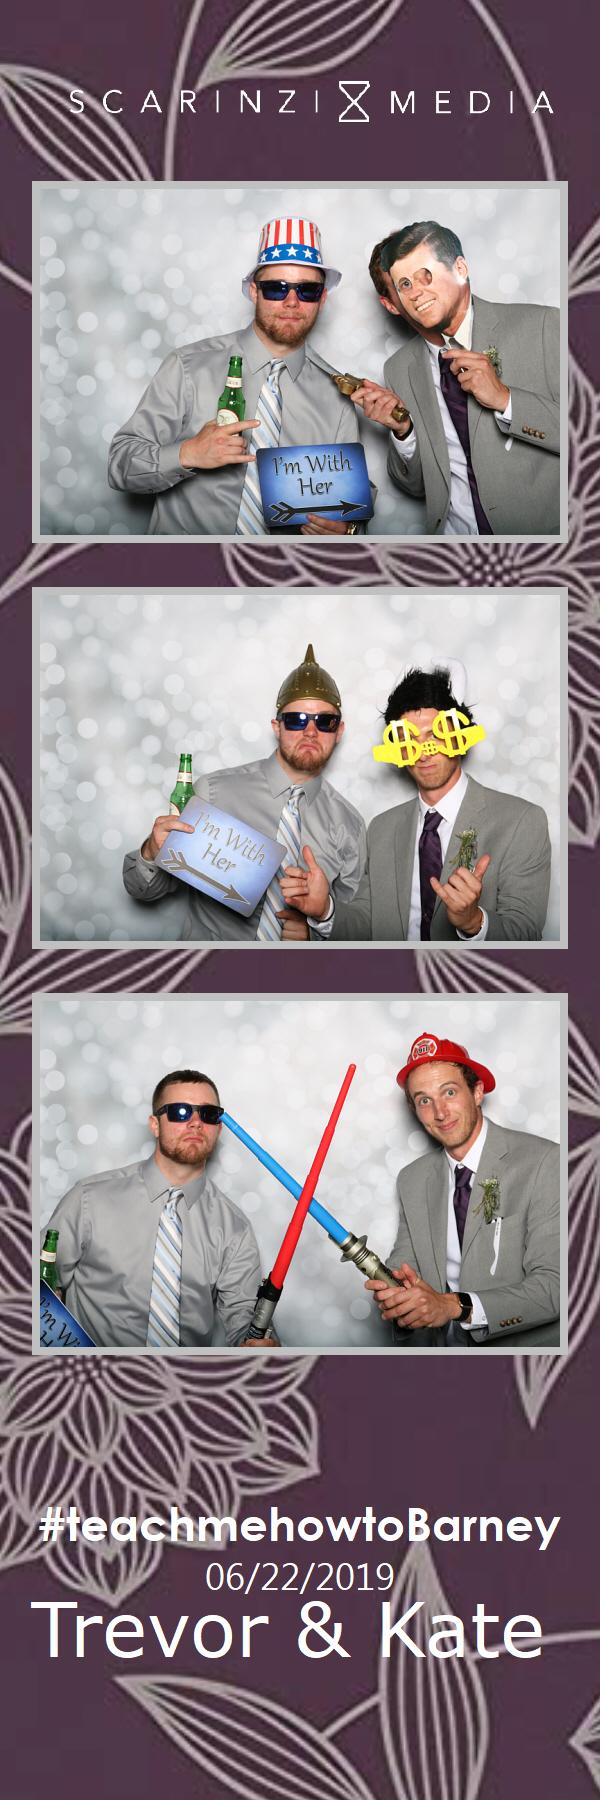 2019.06.22 - Barney Wedding PHOTOBOOTH36.jpg